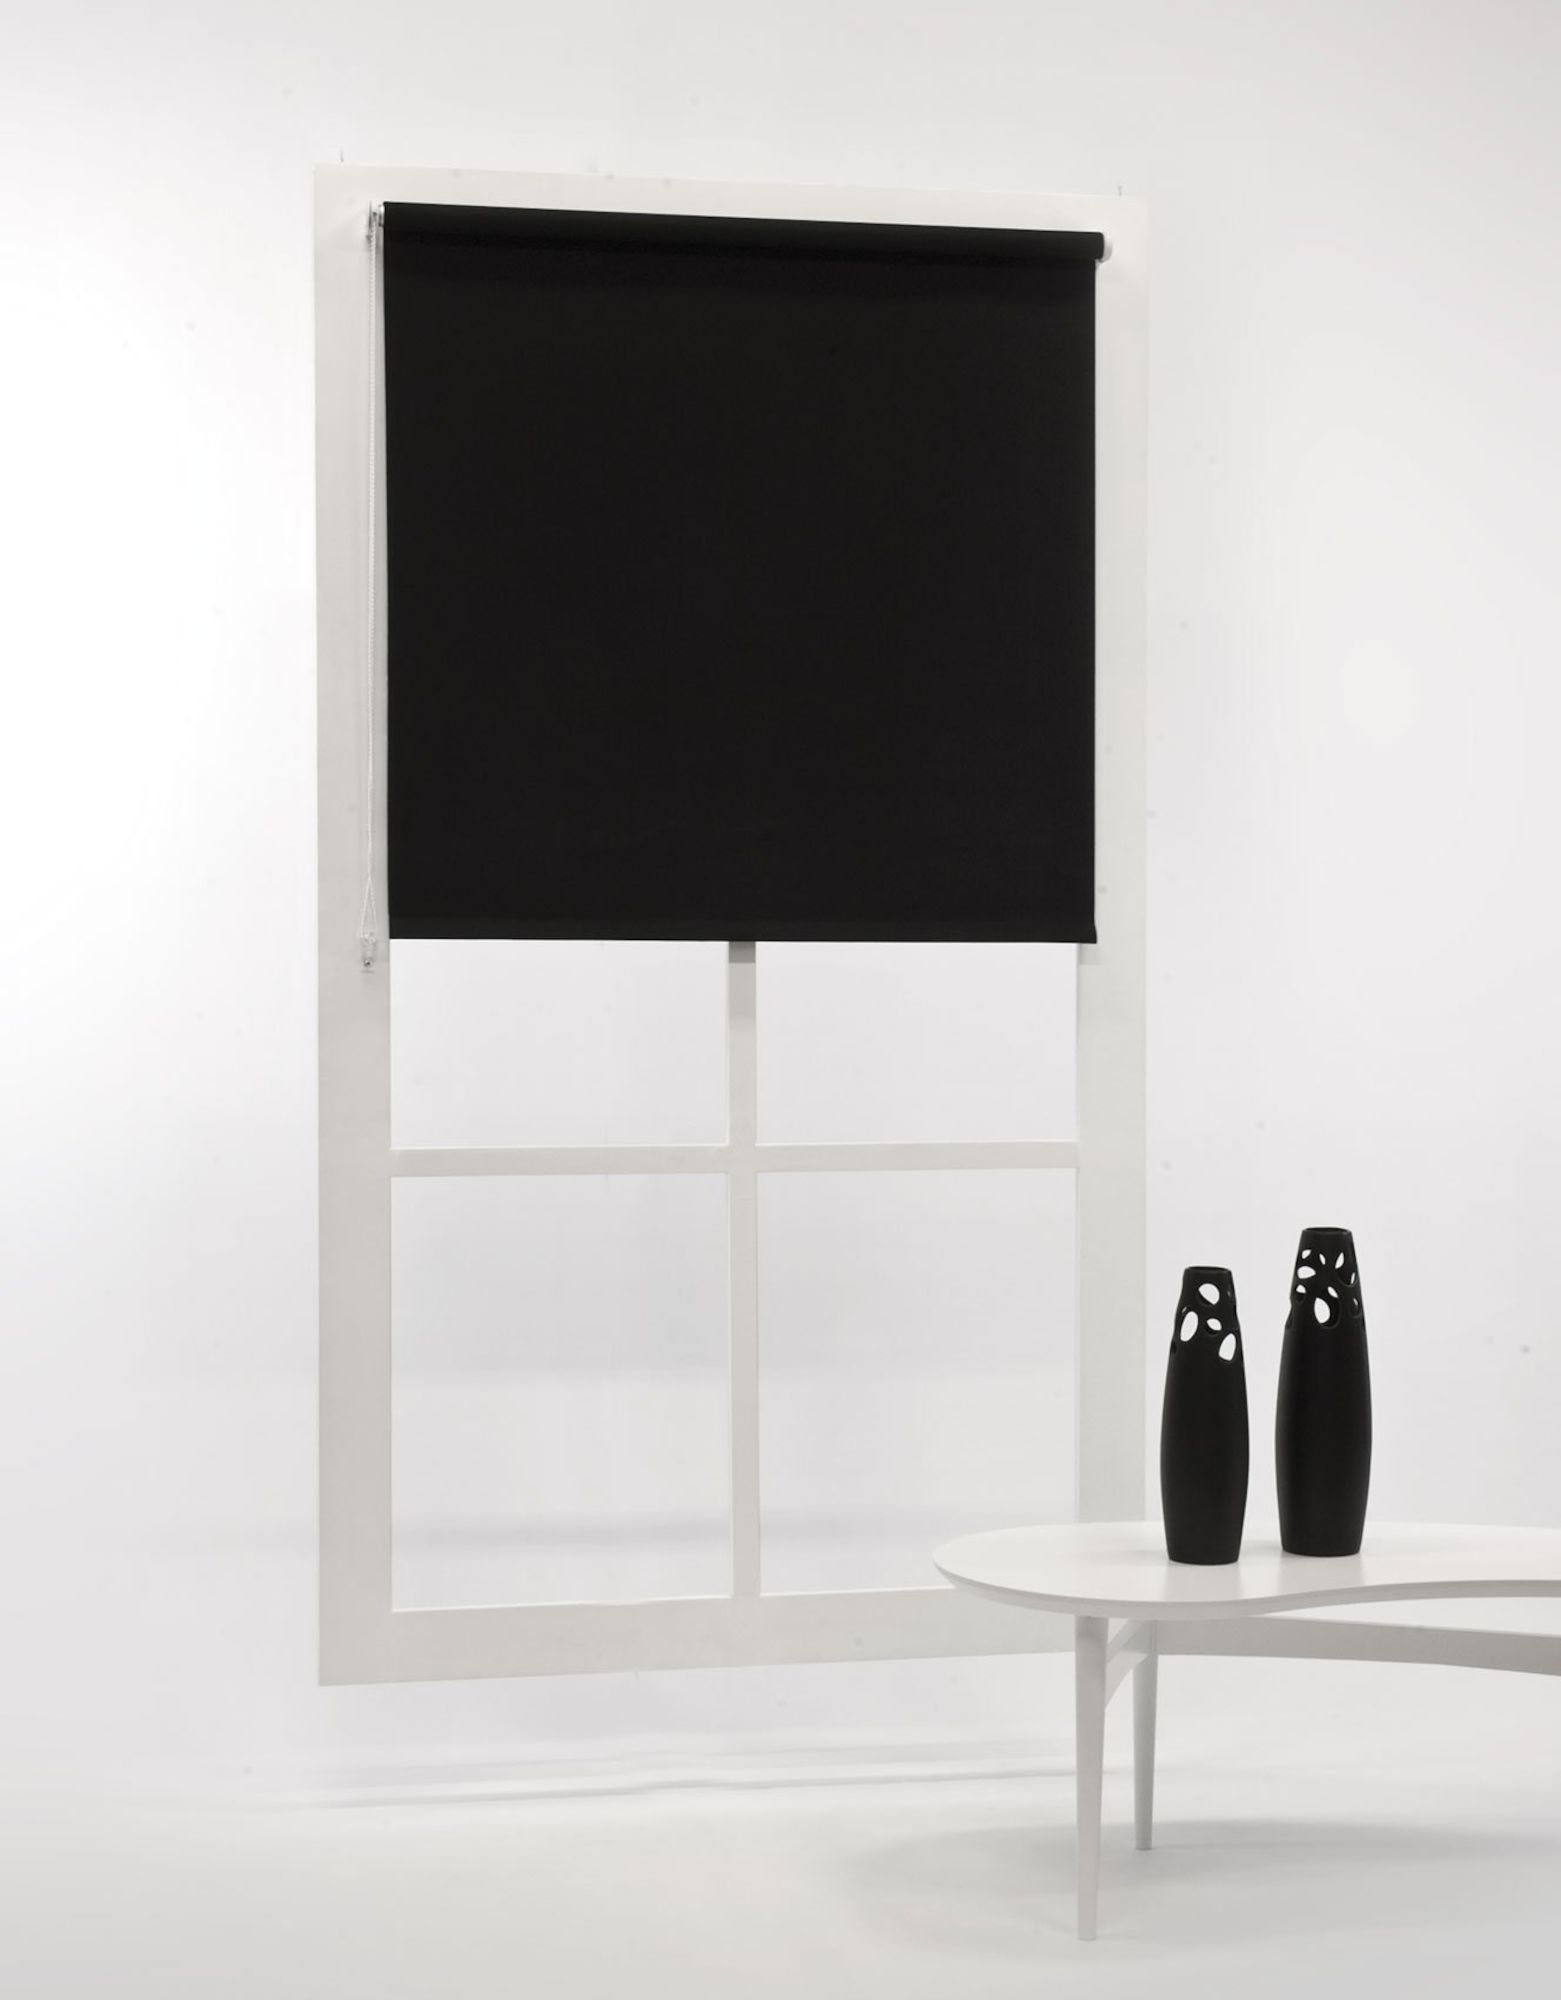 Hasta Blackout Pimennysverho, Black 100x185